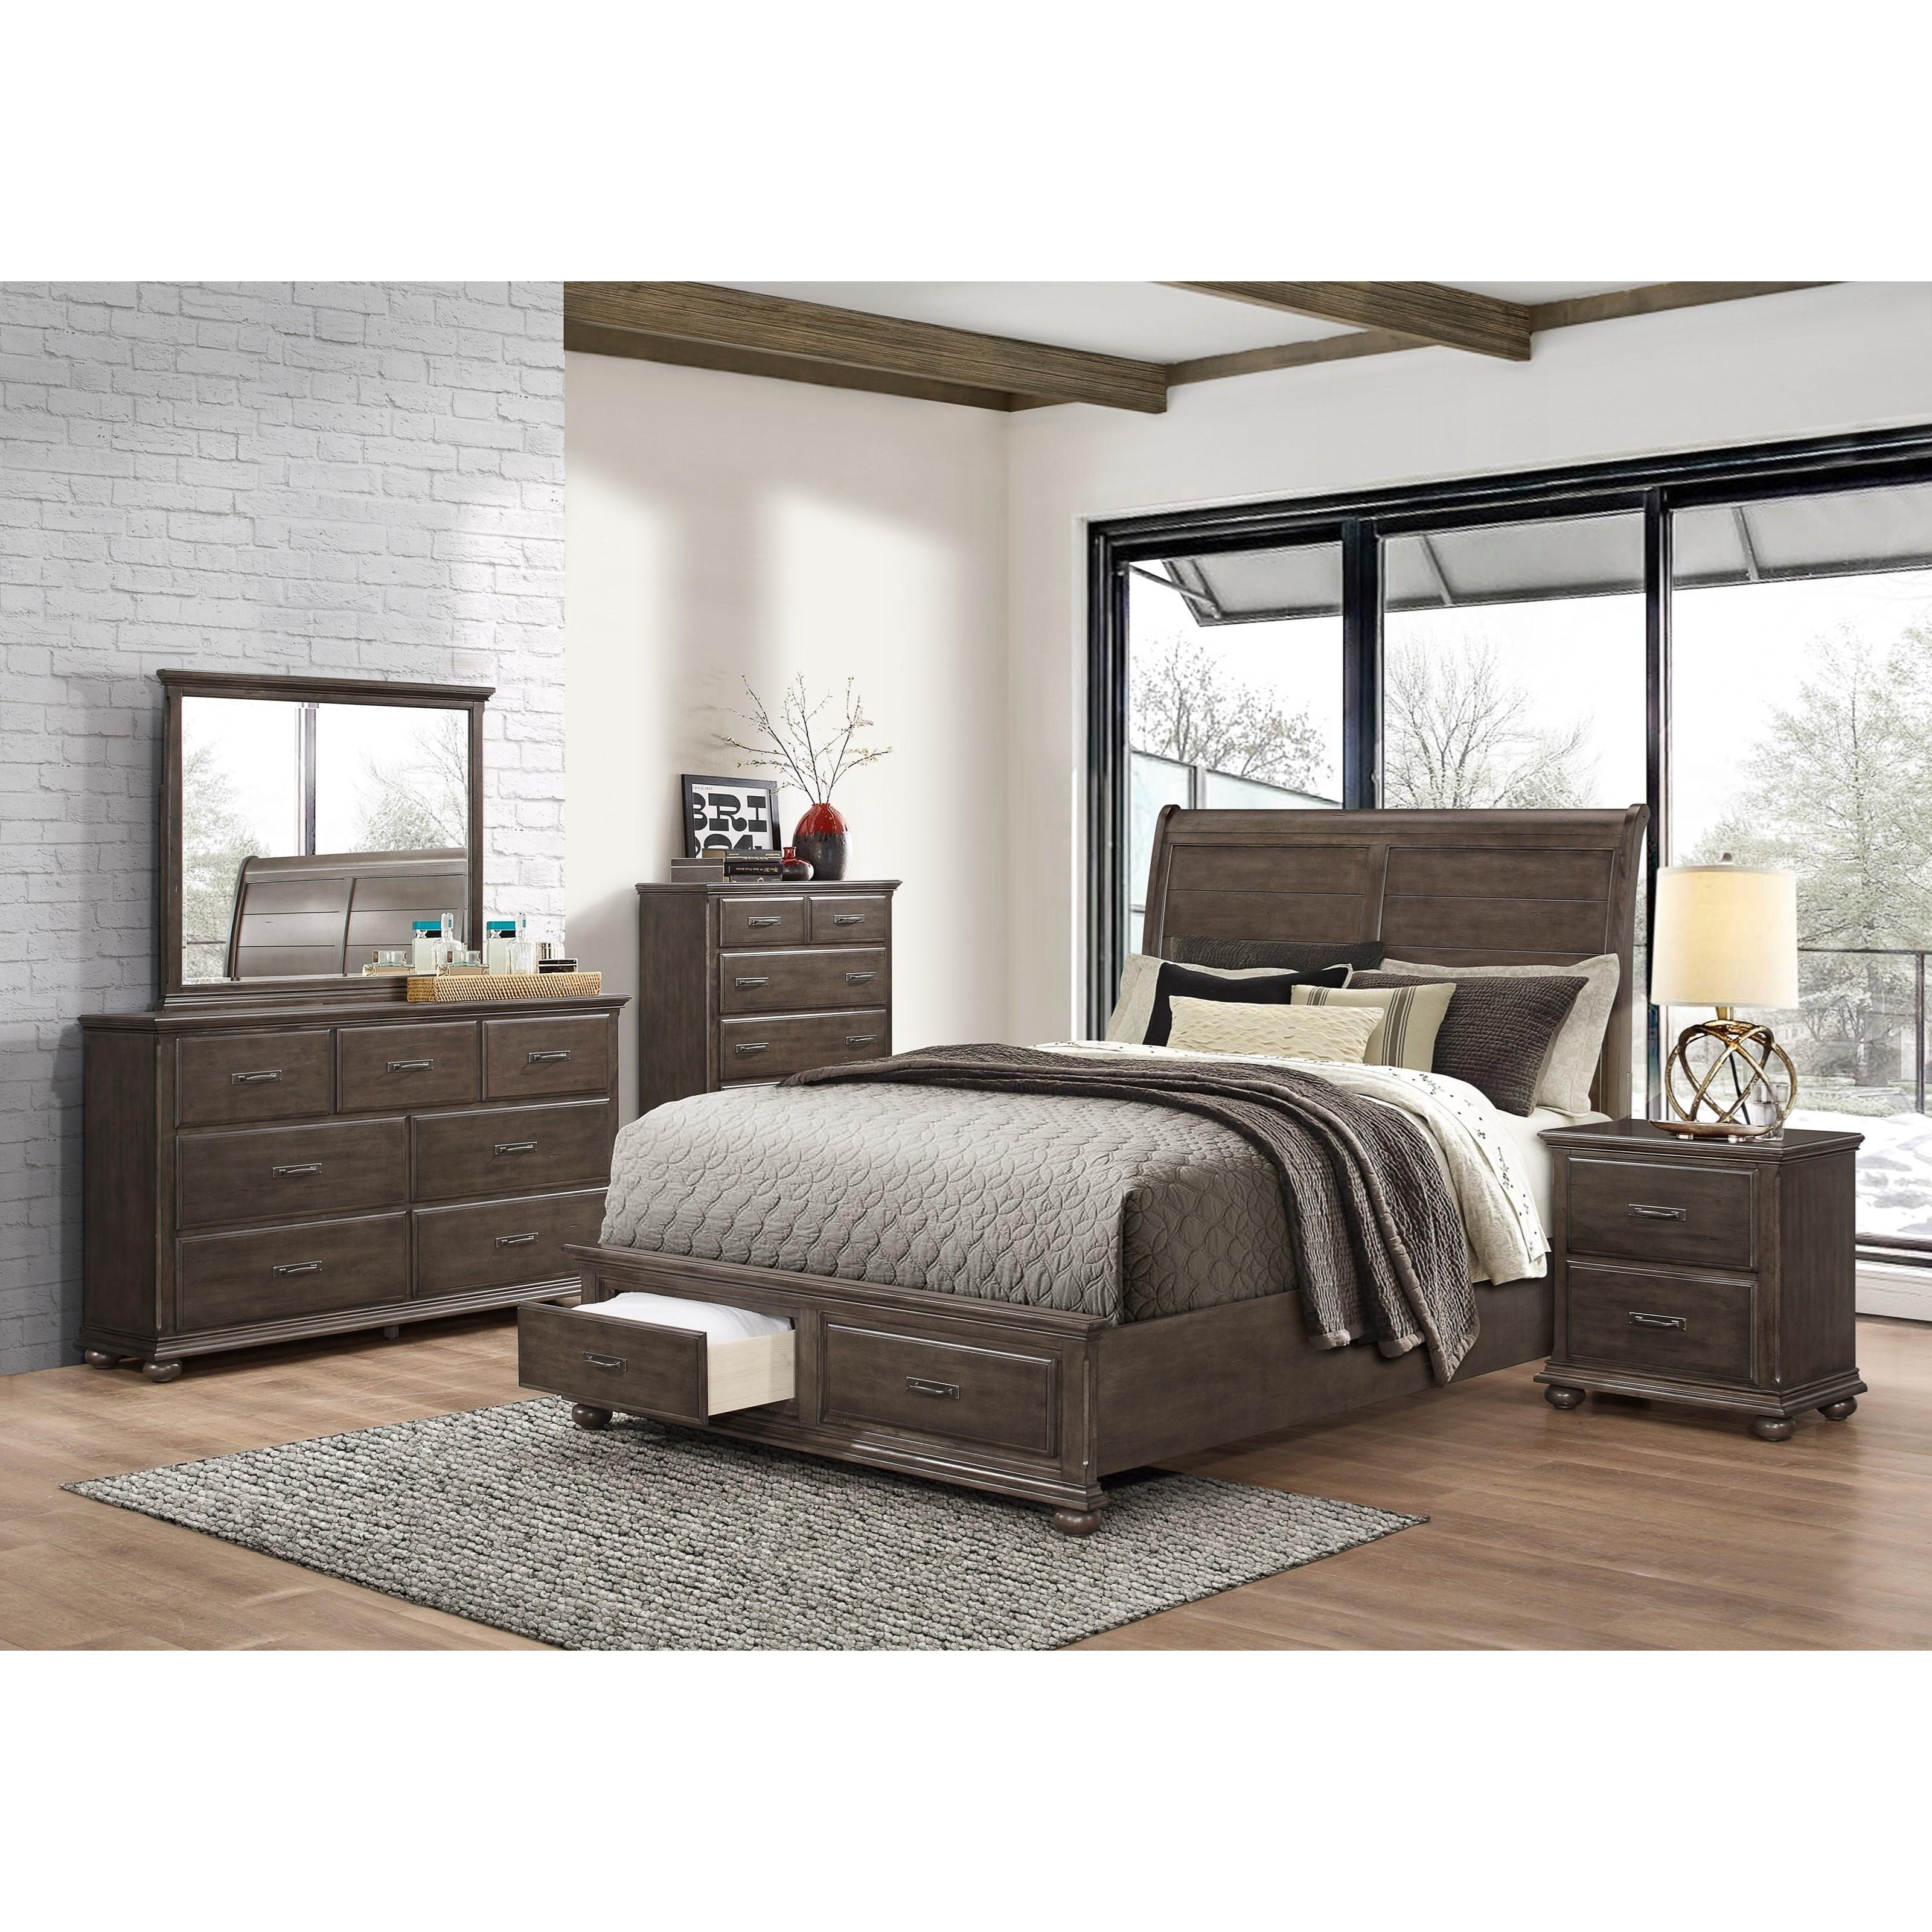 1026 Queen Sleigh Bed by United Furniture Industries at Bullard Furniture